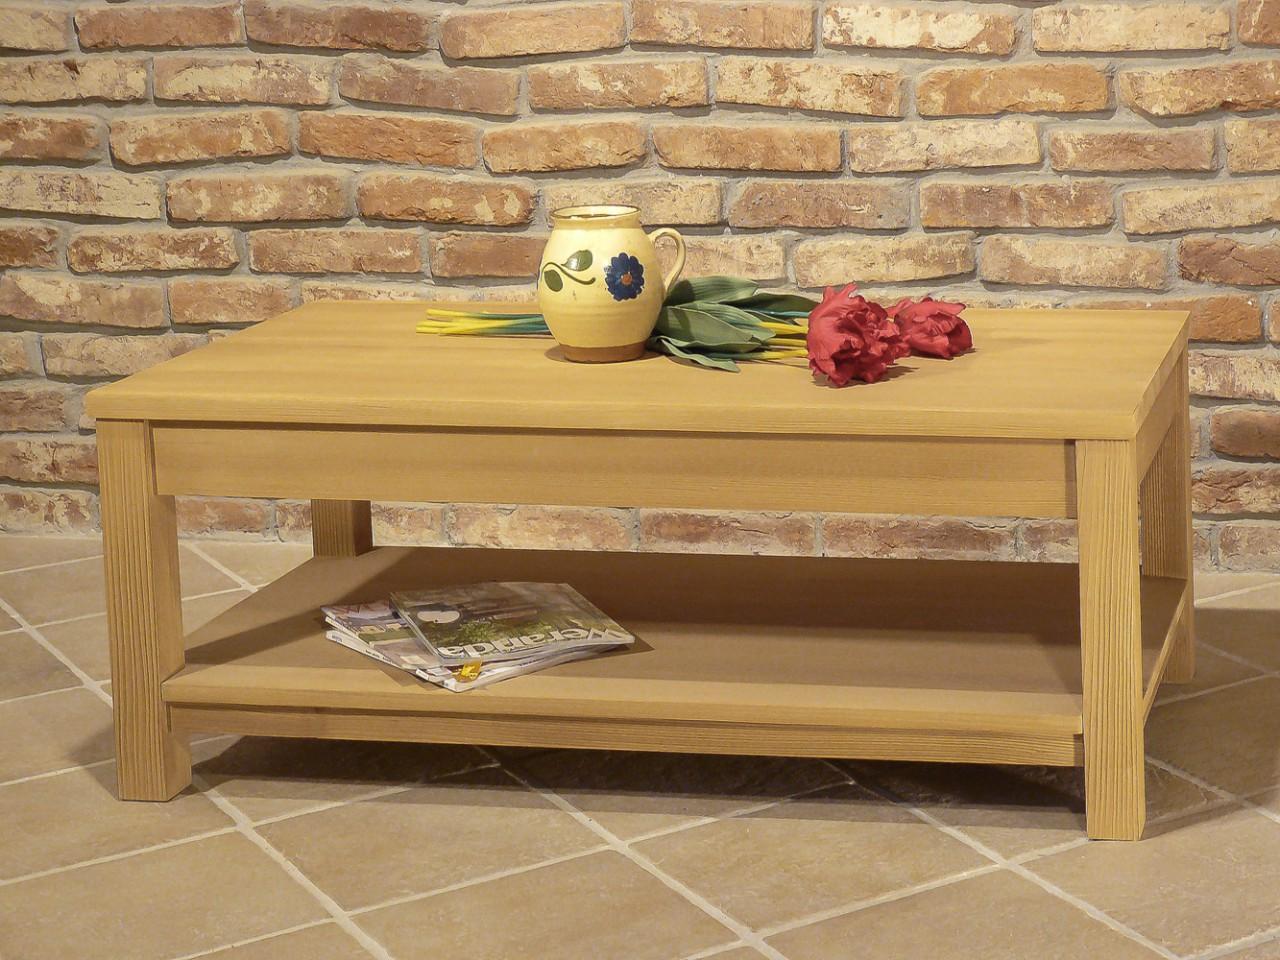 couchtisch bavaria 120 x 70 fichte massivholz geb rstet. Black Bedroom Furniture Sets. Home Design Ideas